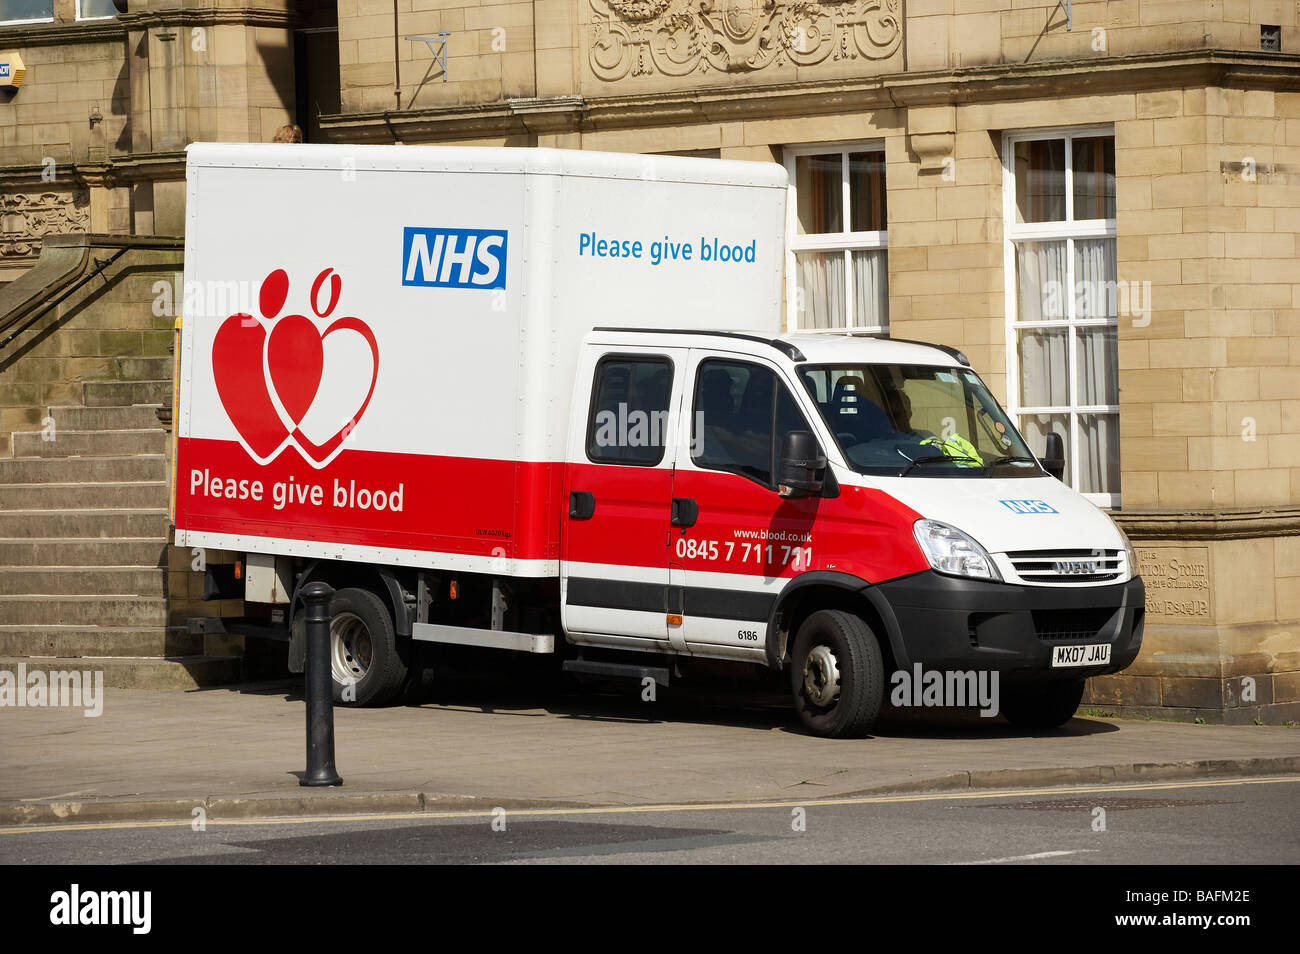 NATIONAL HEALTH SERVICE NHS BLOOD DONOR FAHRZEUG Stockbild